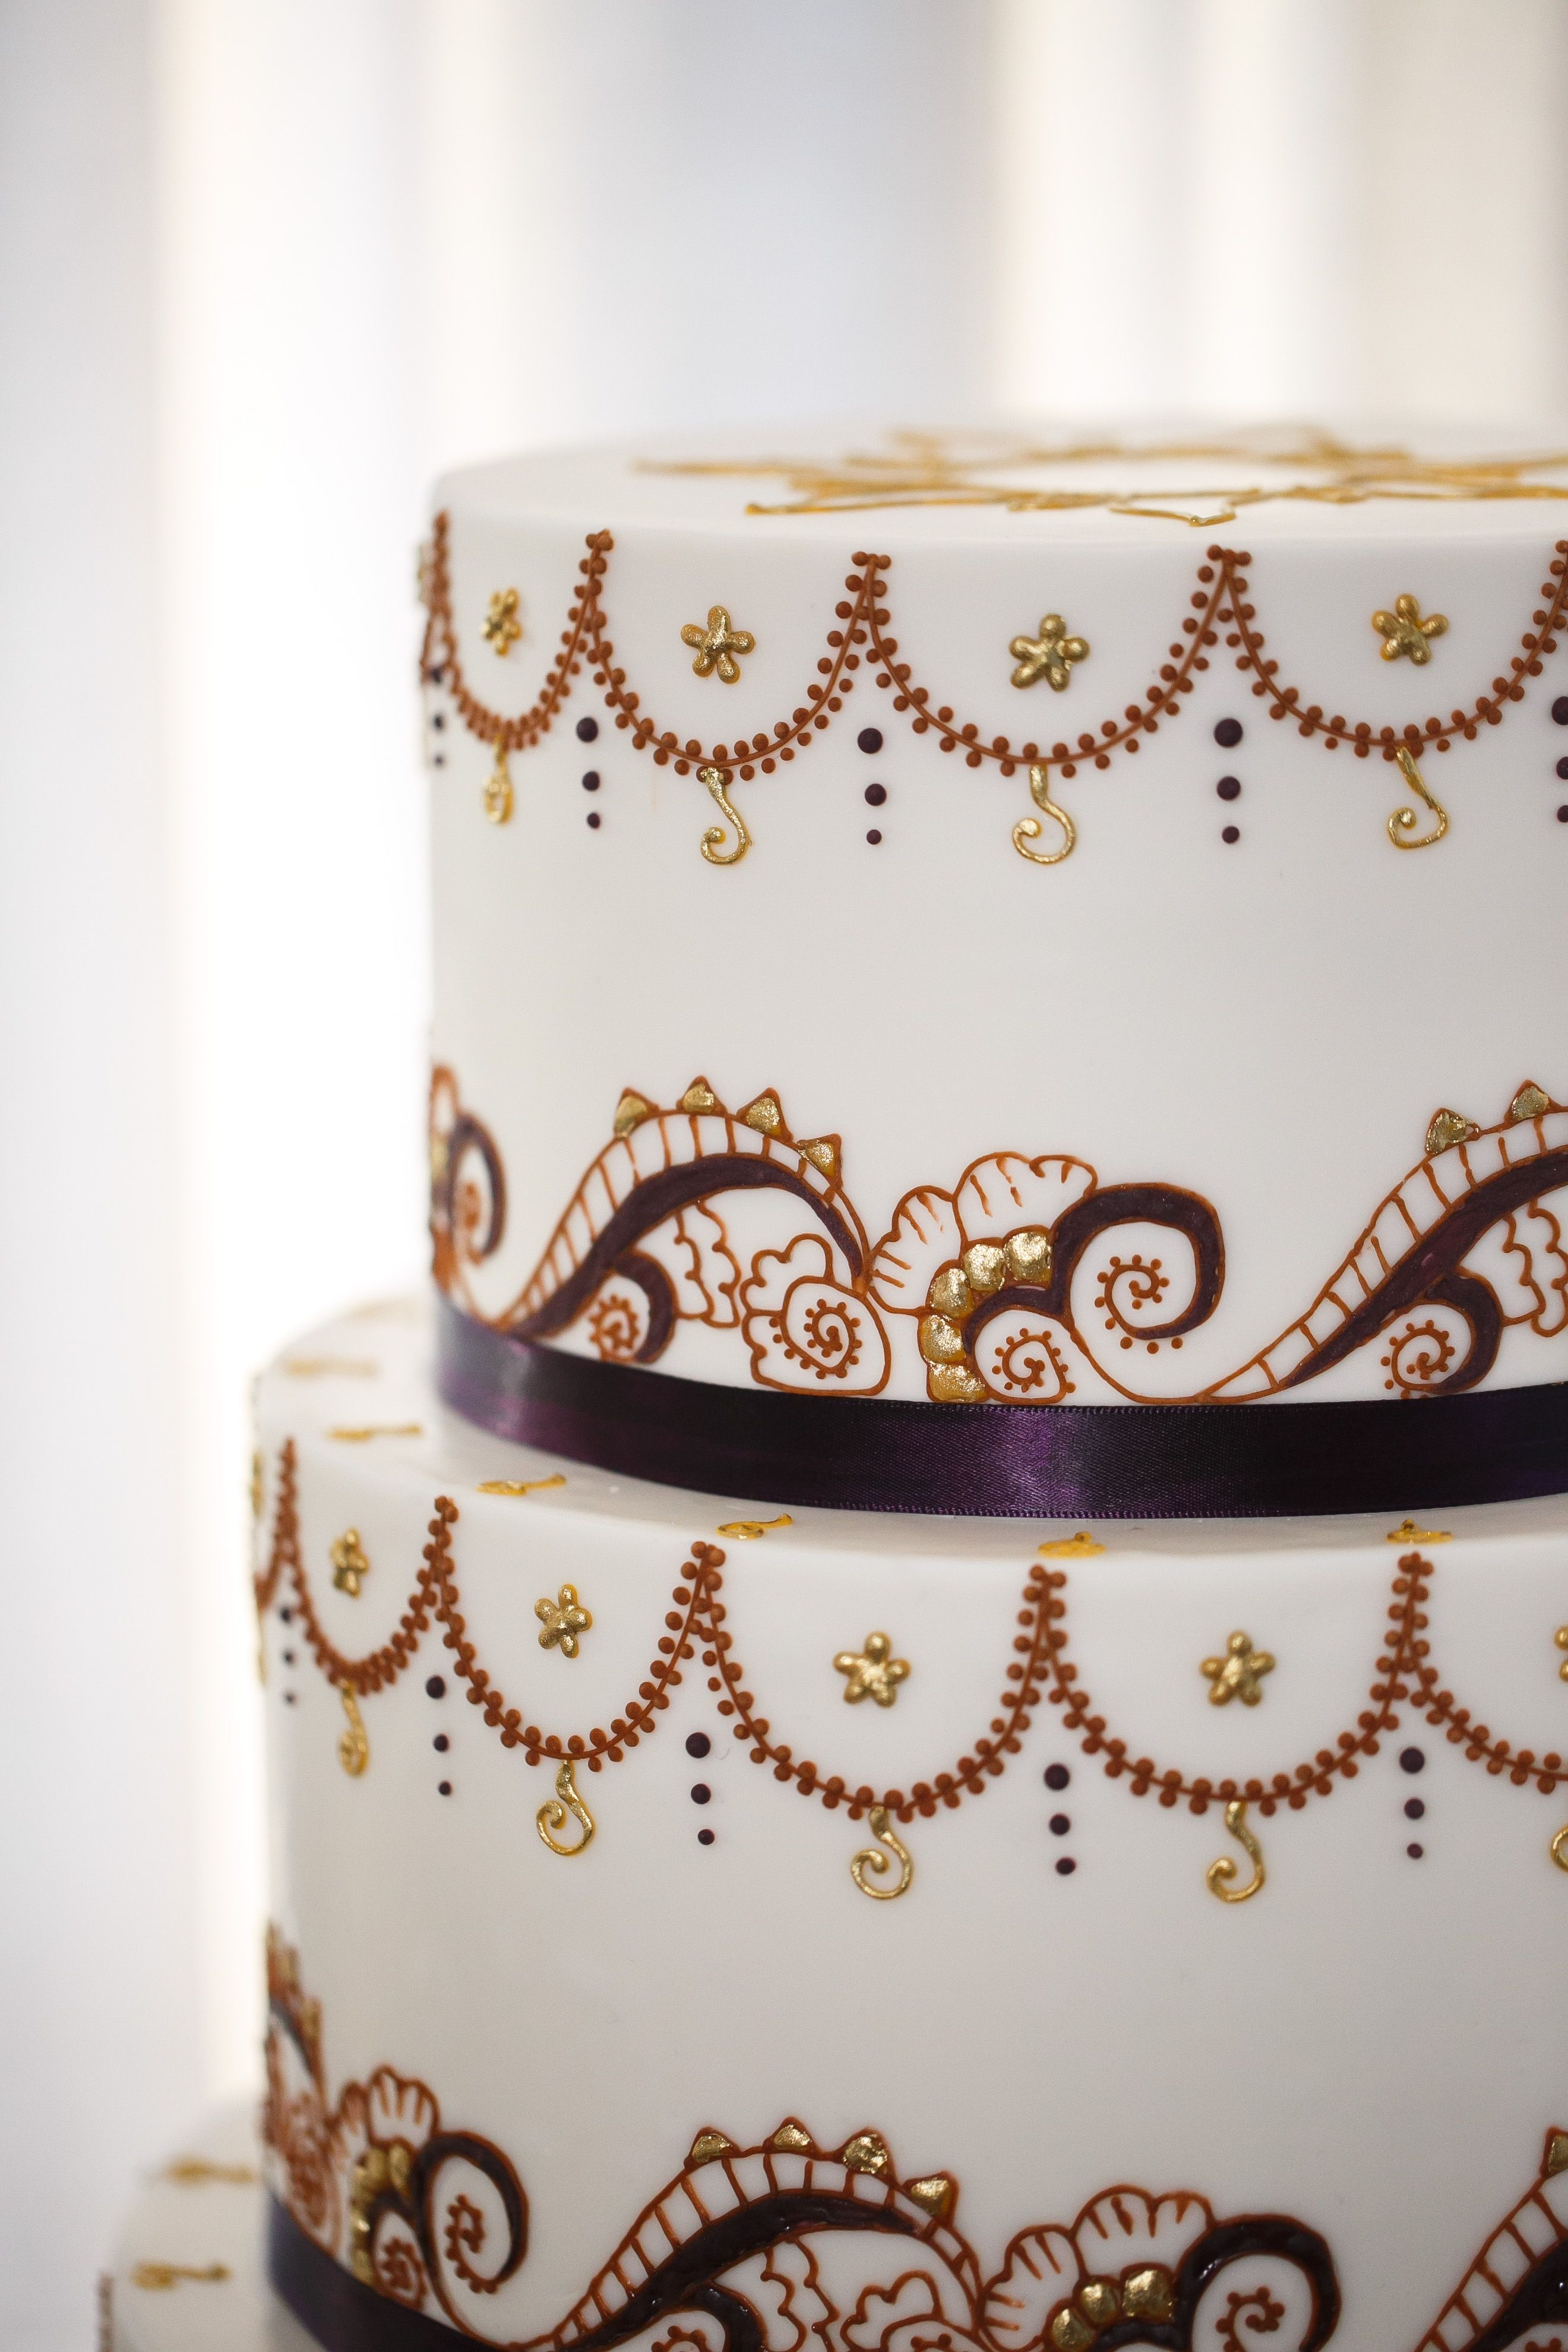 3 tier wedding cake • bold modern elegant • intricate hand-piped ...